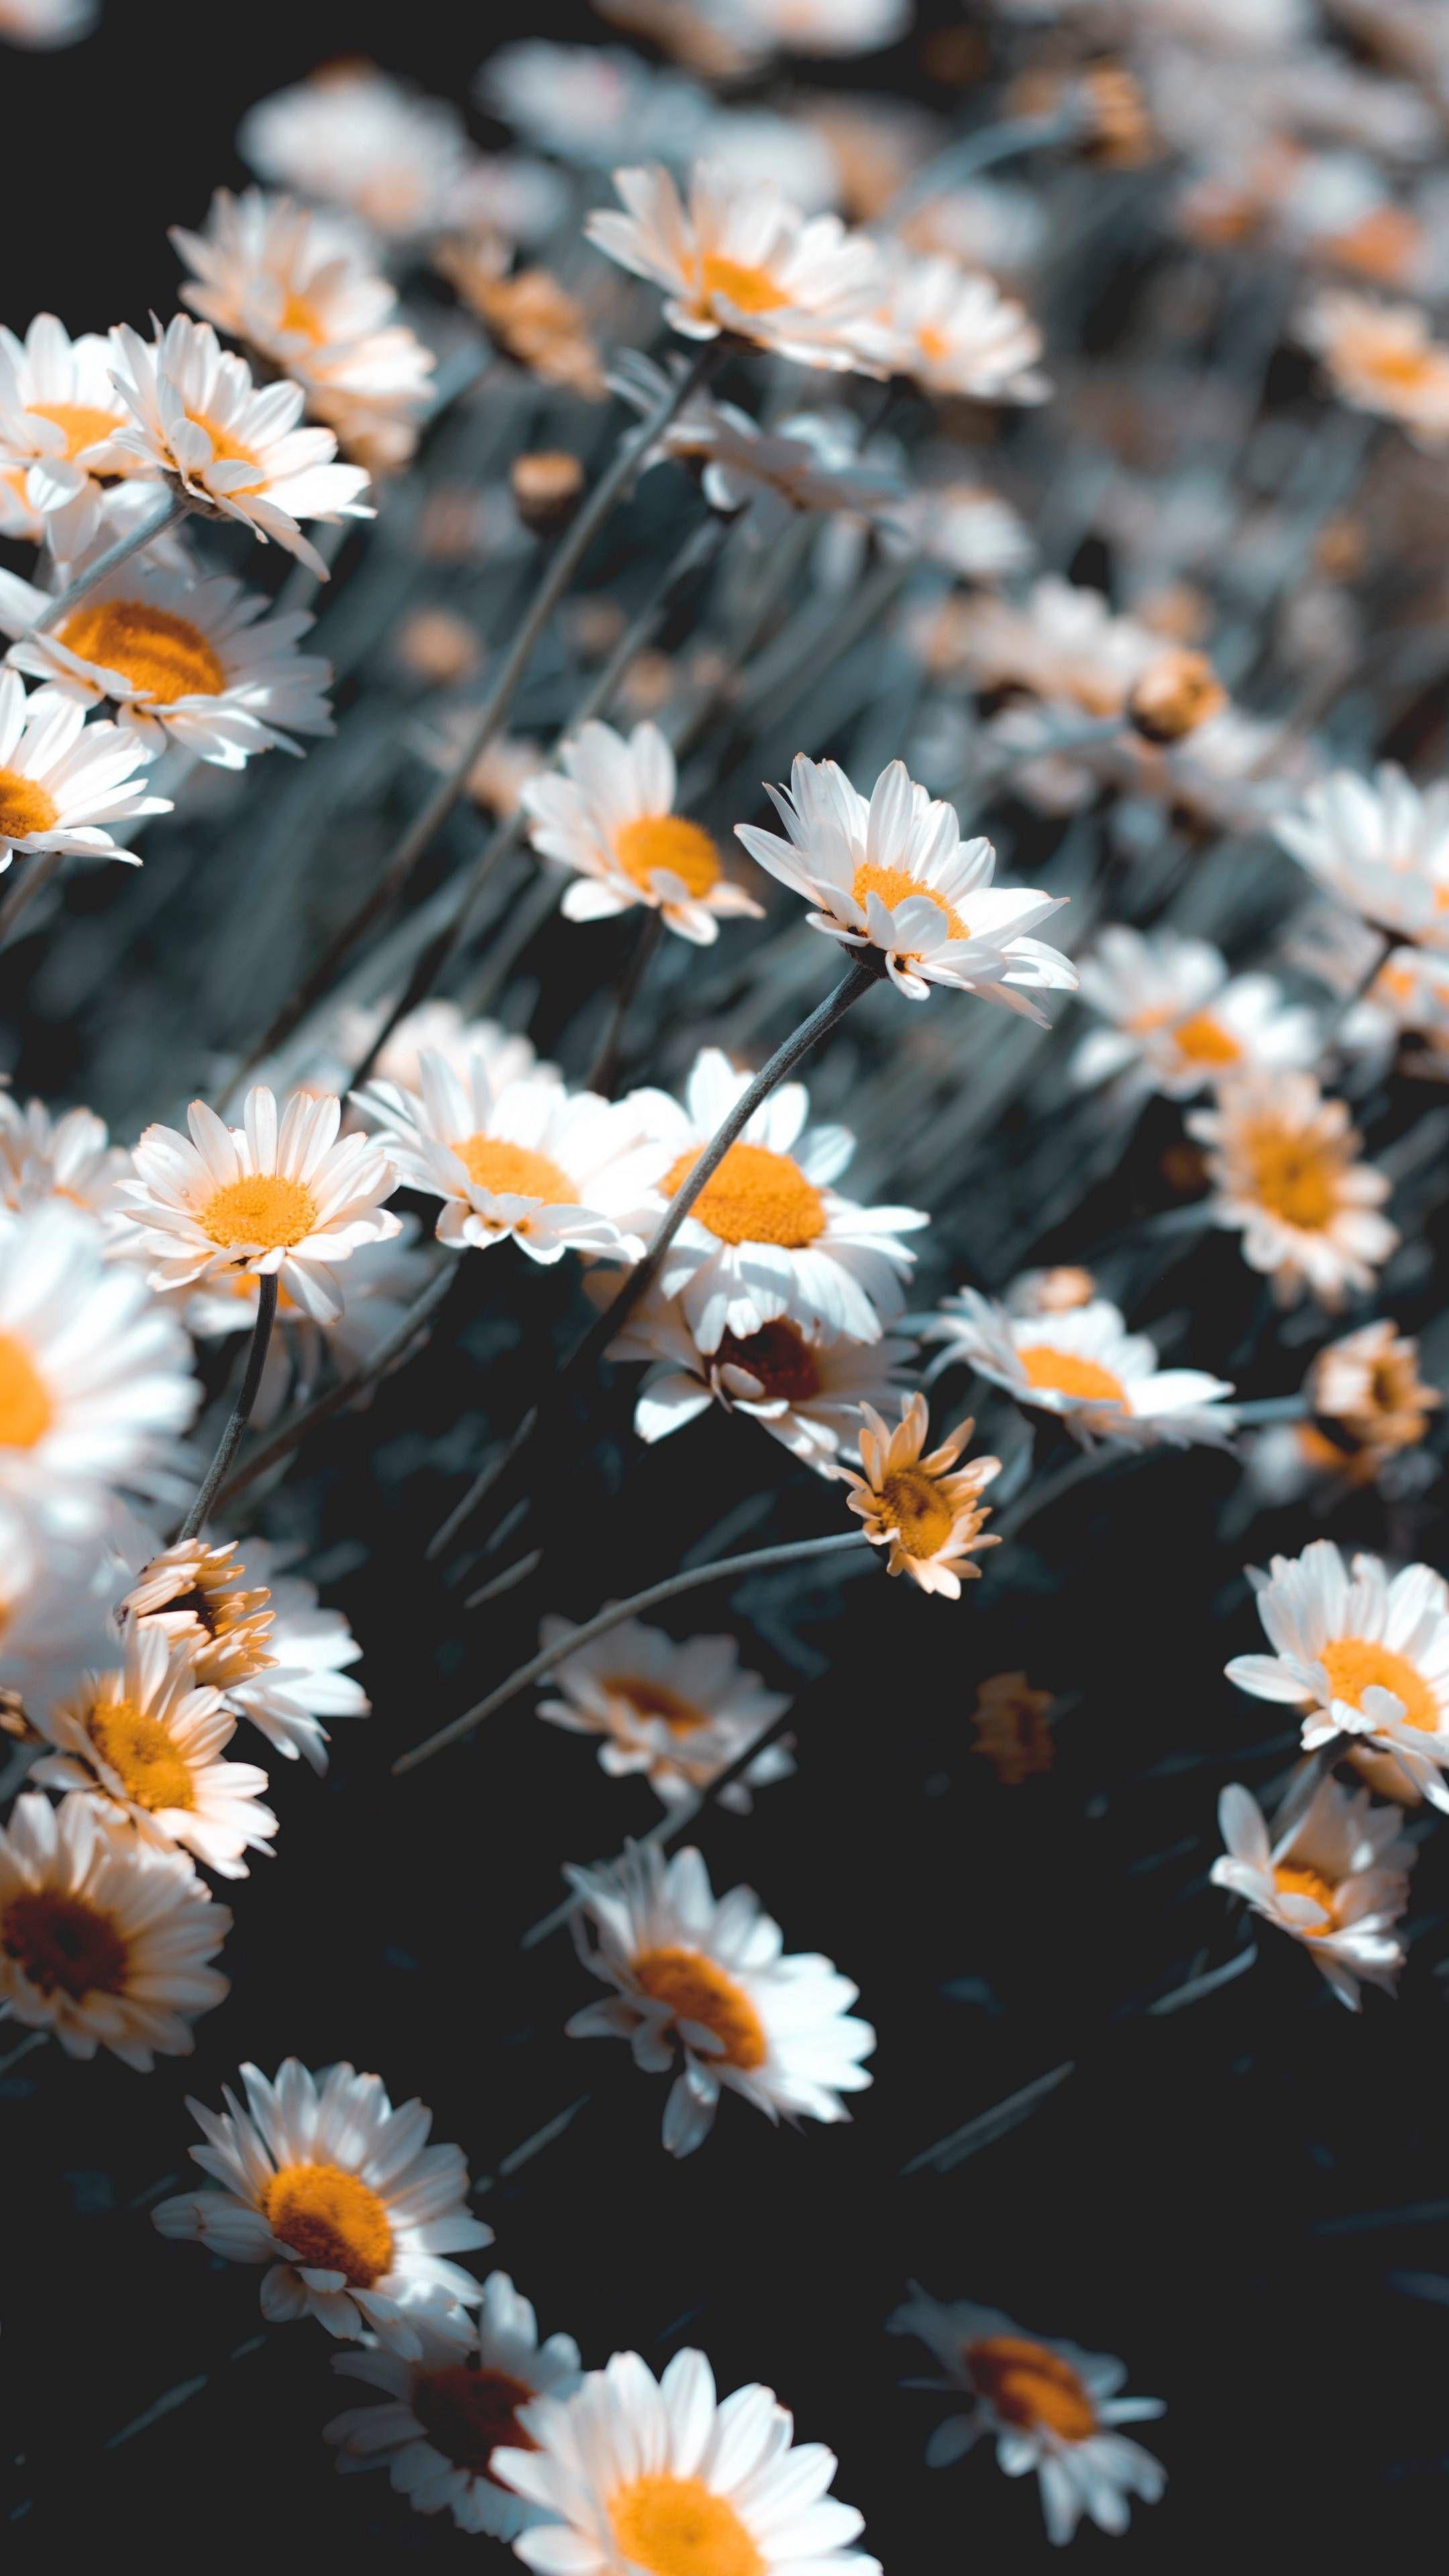 Lataa Iphone Xs Iphone Xs Max Iphone Xr Hd Taustakuvia Kamomilla Kukkia Val Flower Iphone Wallpaper Sunflower Iphone Wallpaper Backgrounds Phone Wallpapers